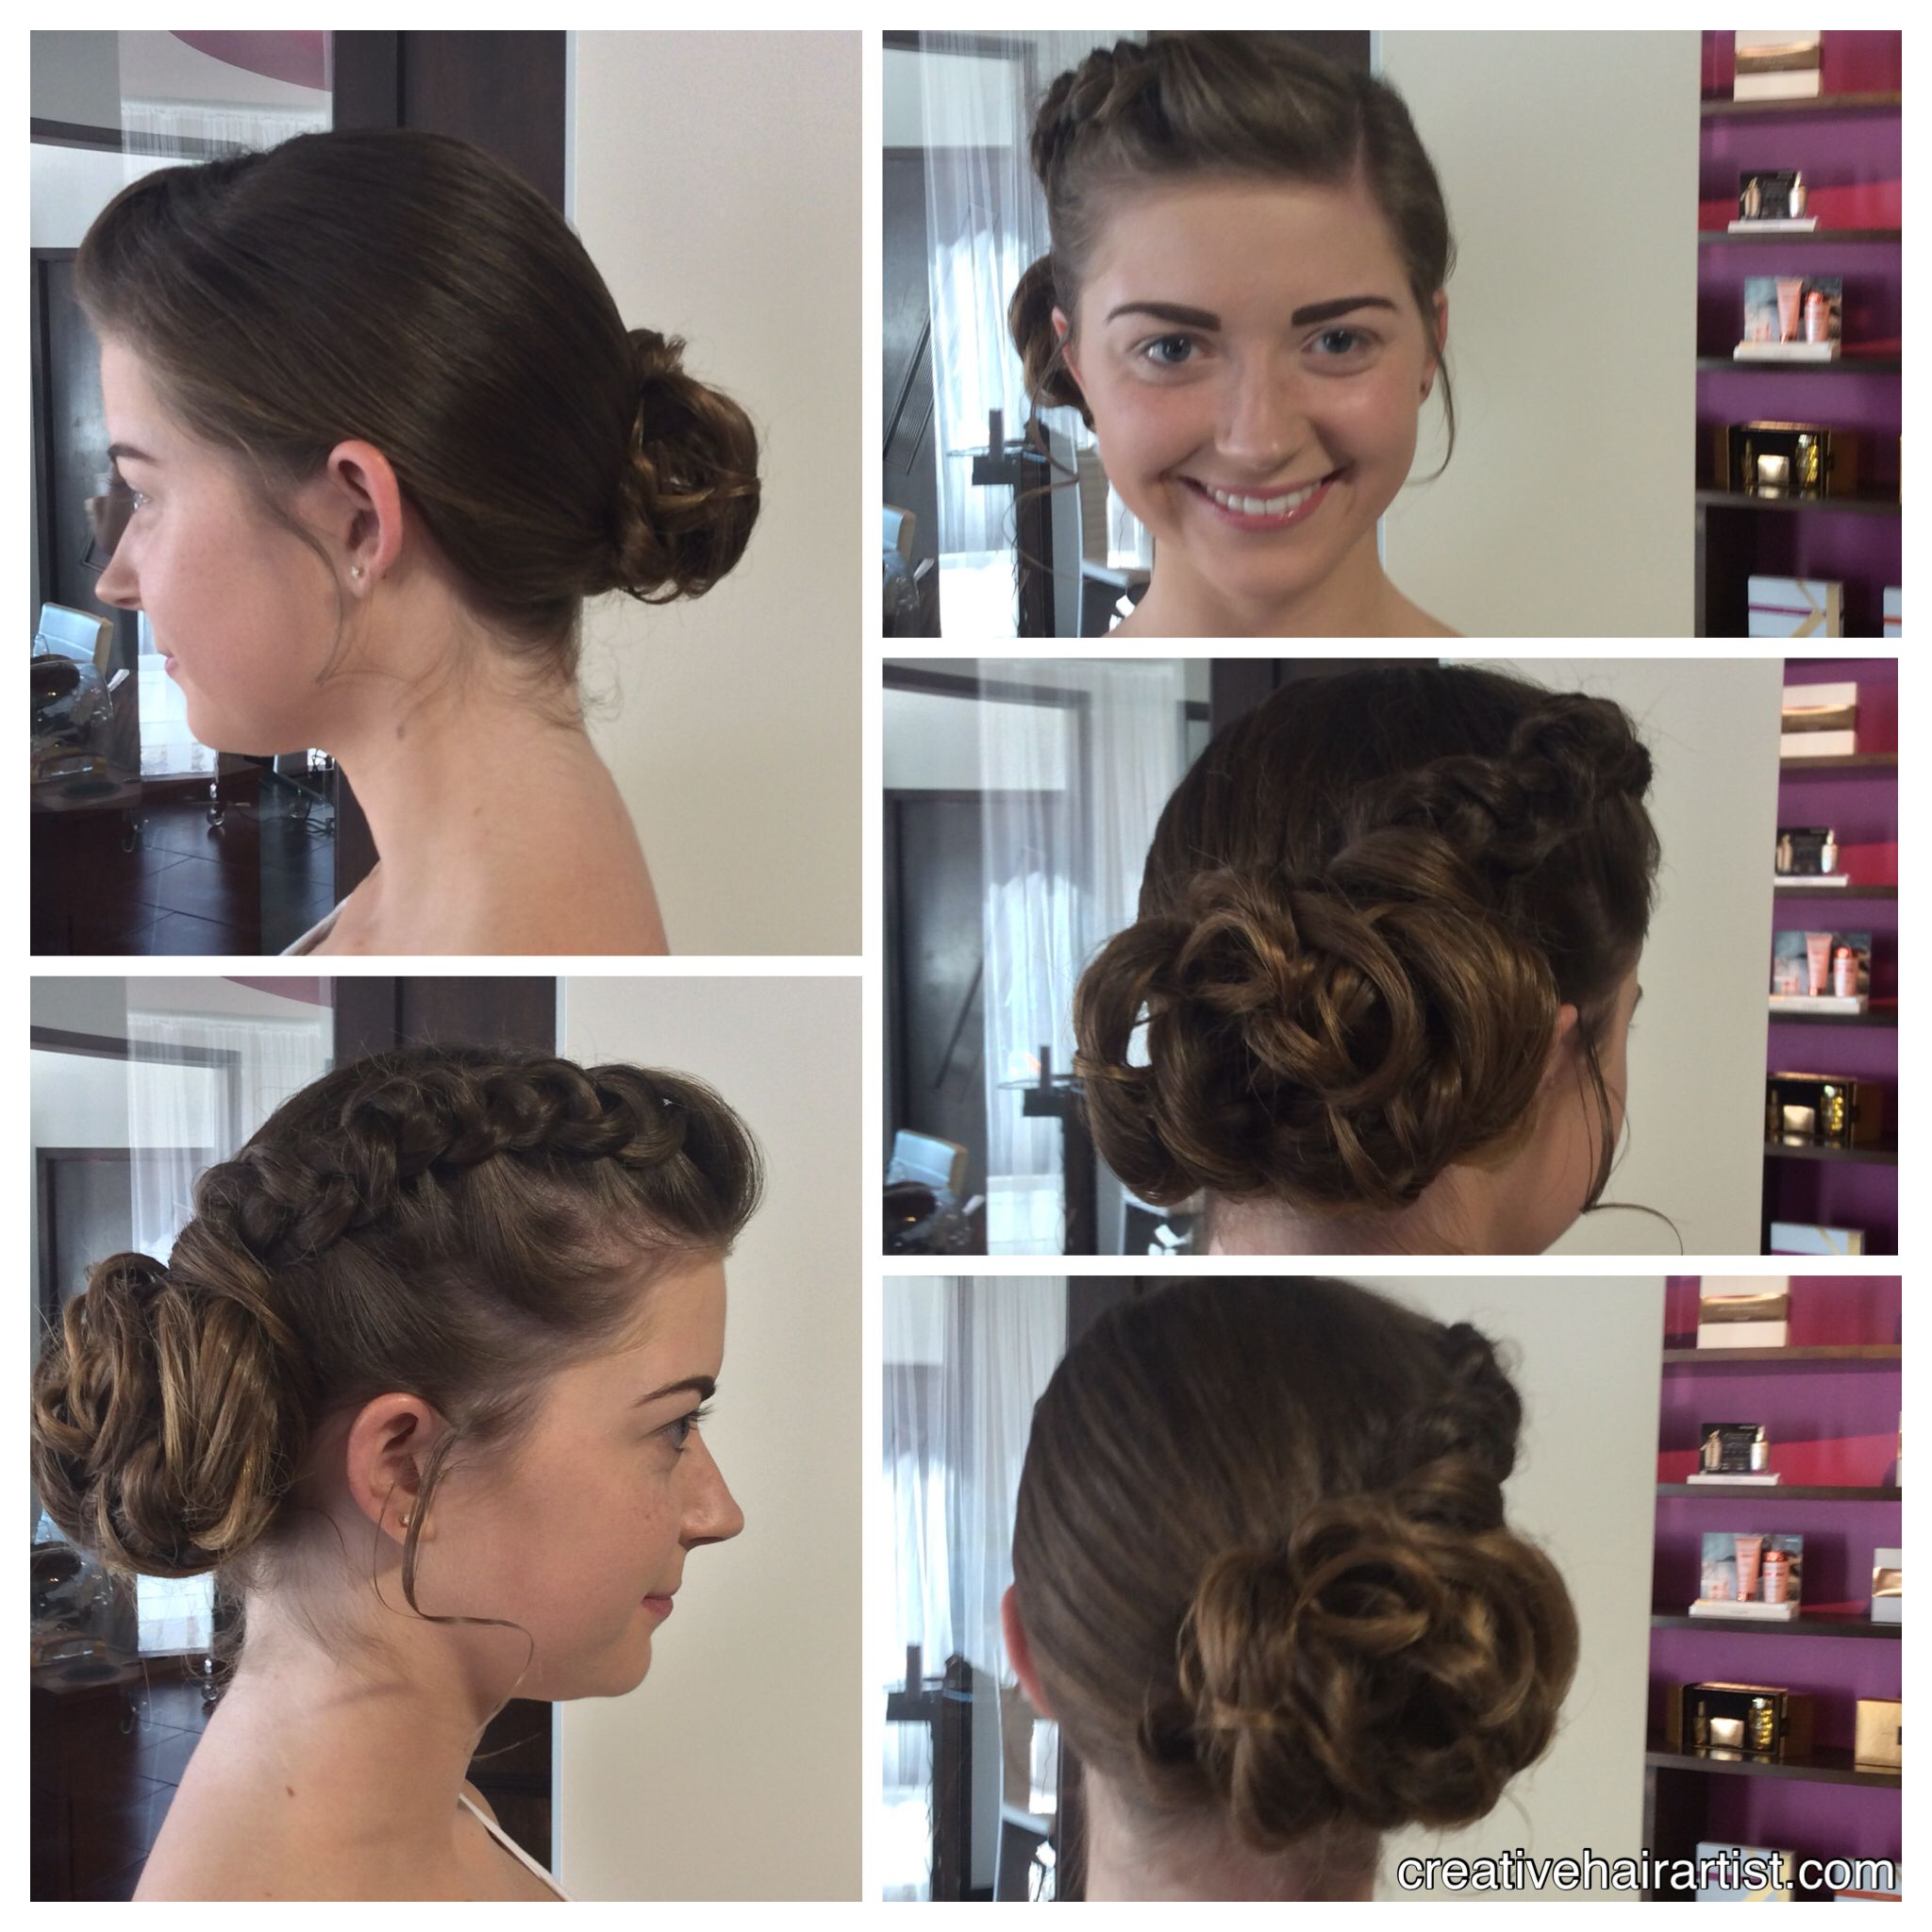 My gorgeous client is #Homecoming ready!!! #Updo #creativehairartist #beautybydarlene